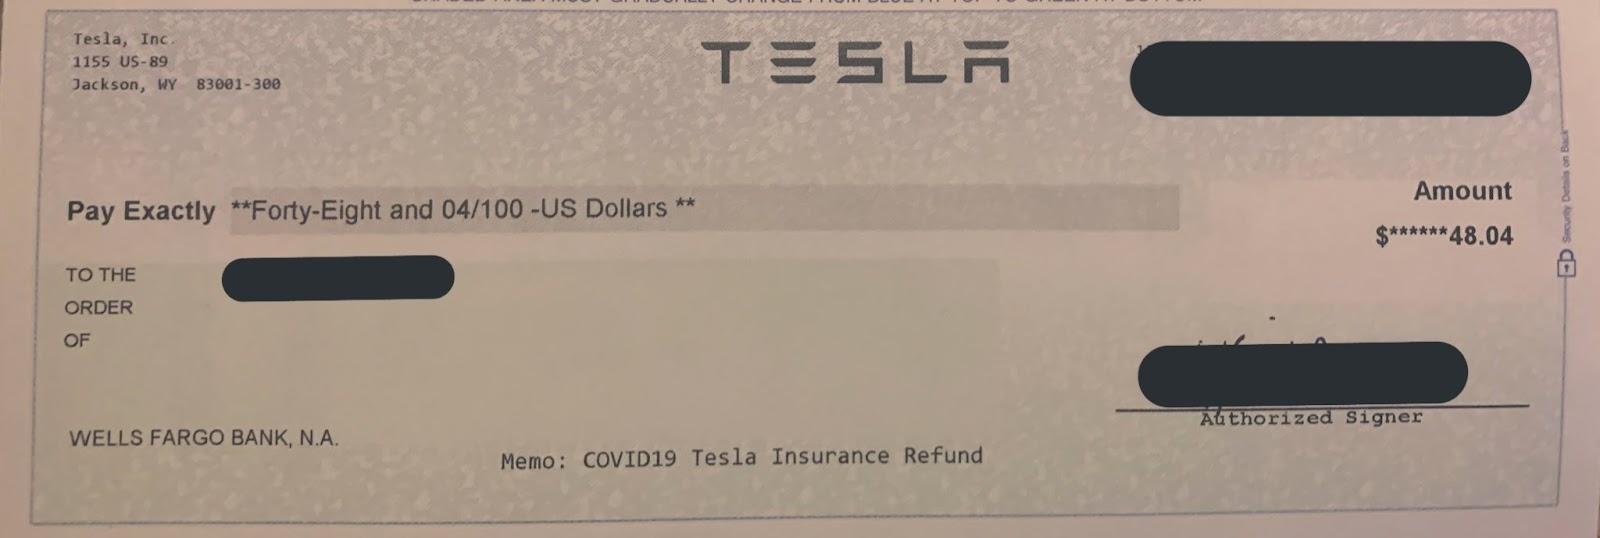 Tesla assurance